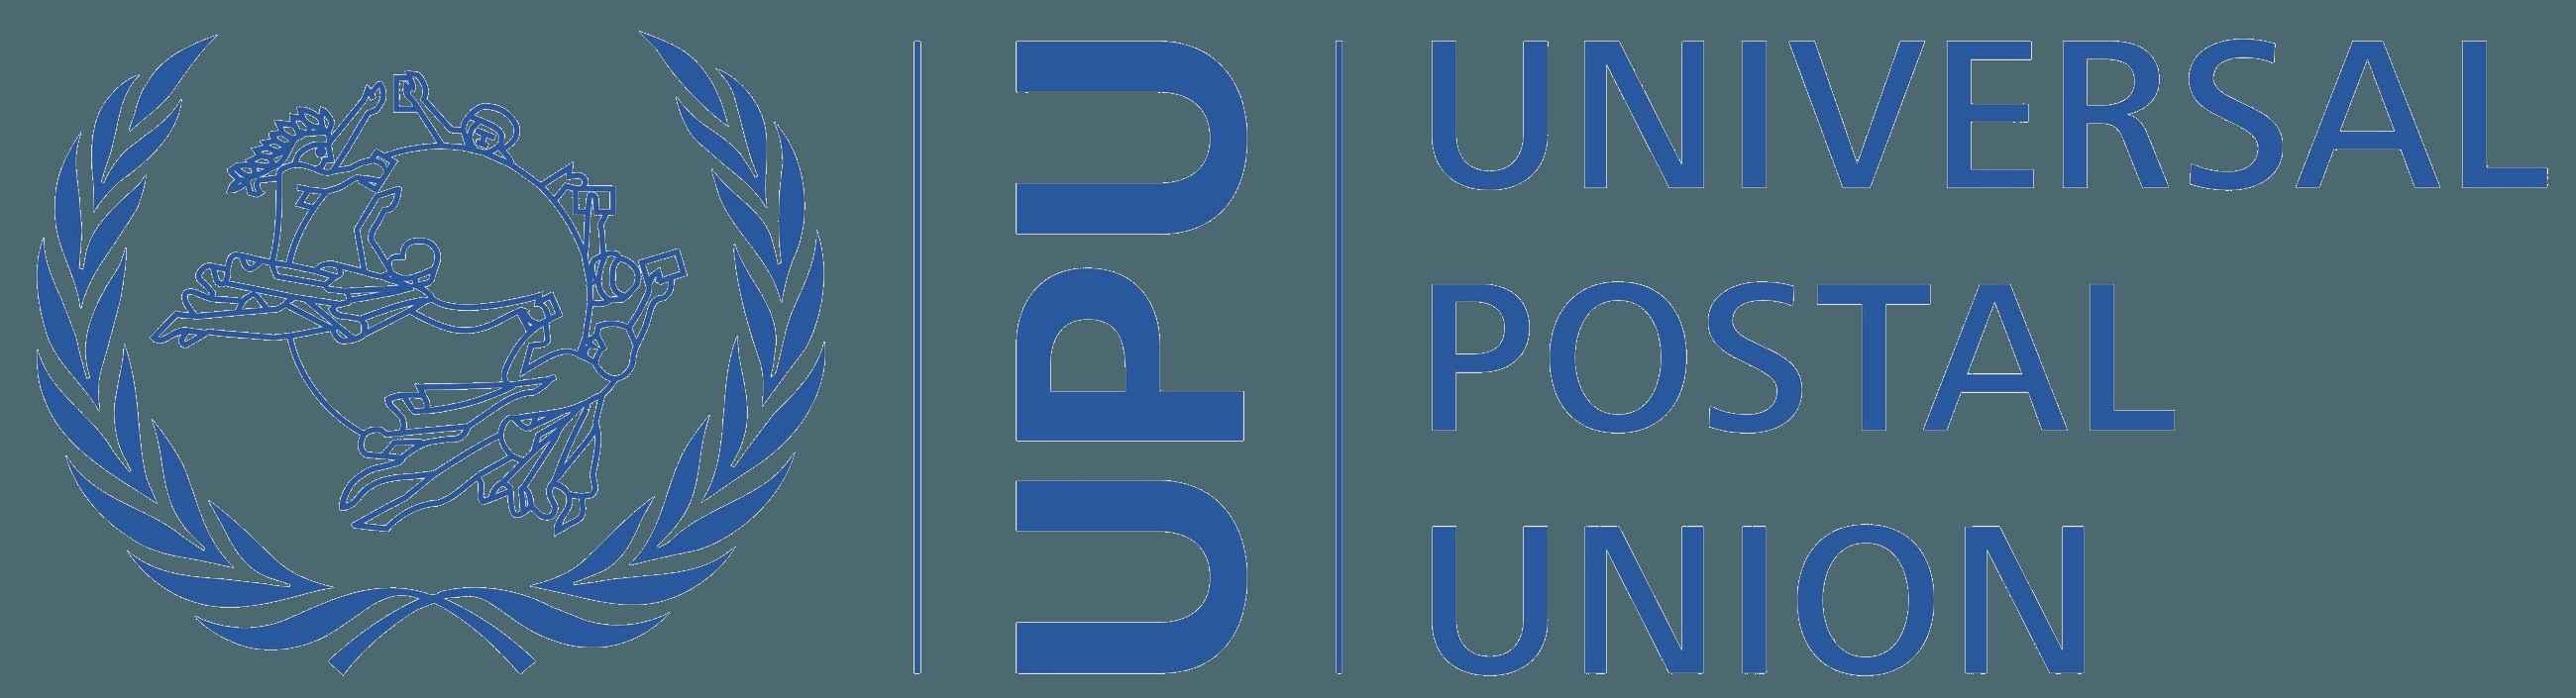 upu logo freelogovectors.net